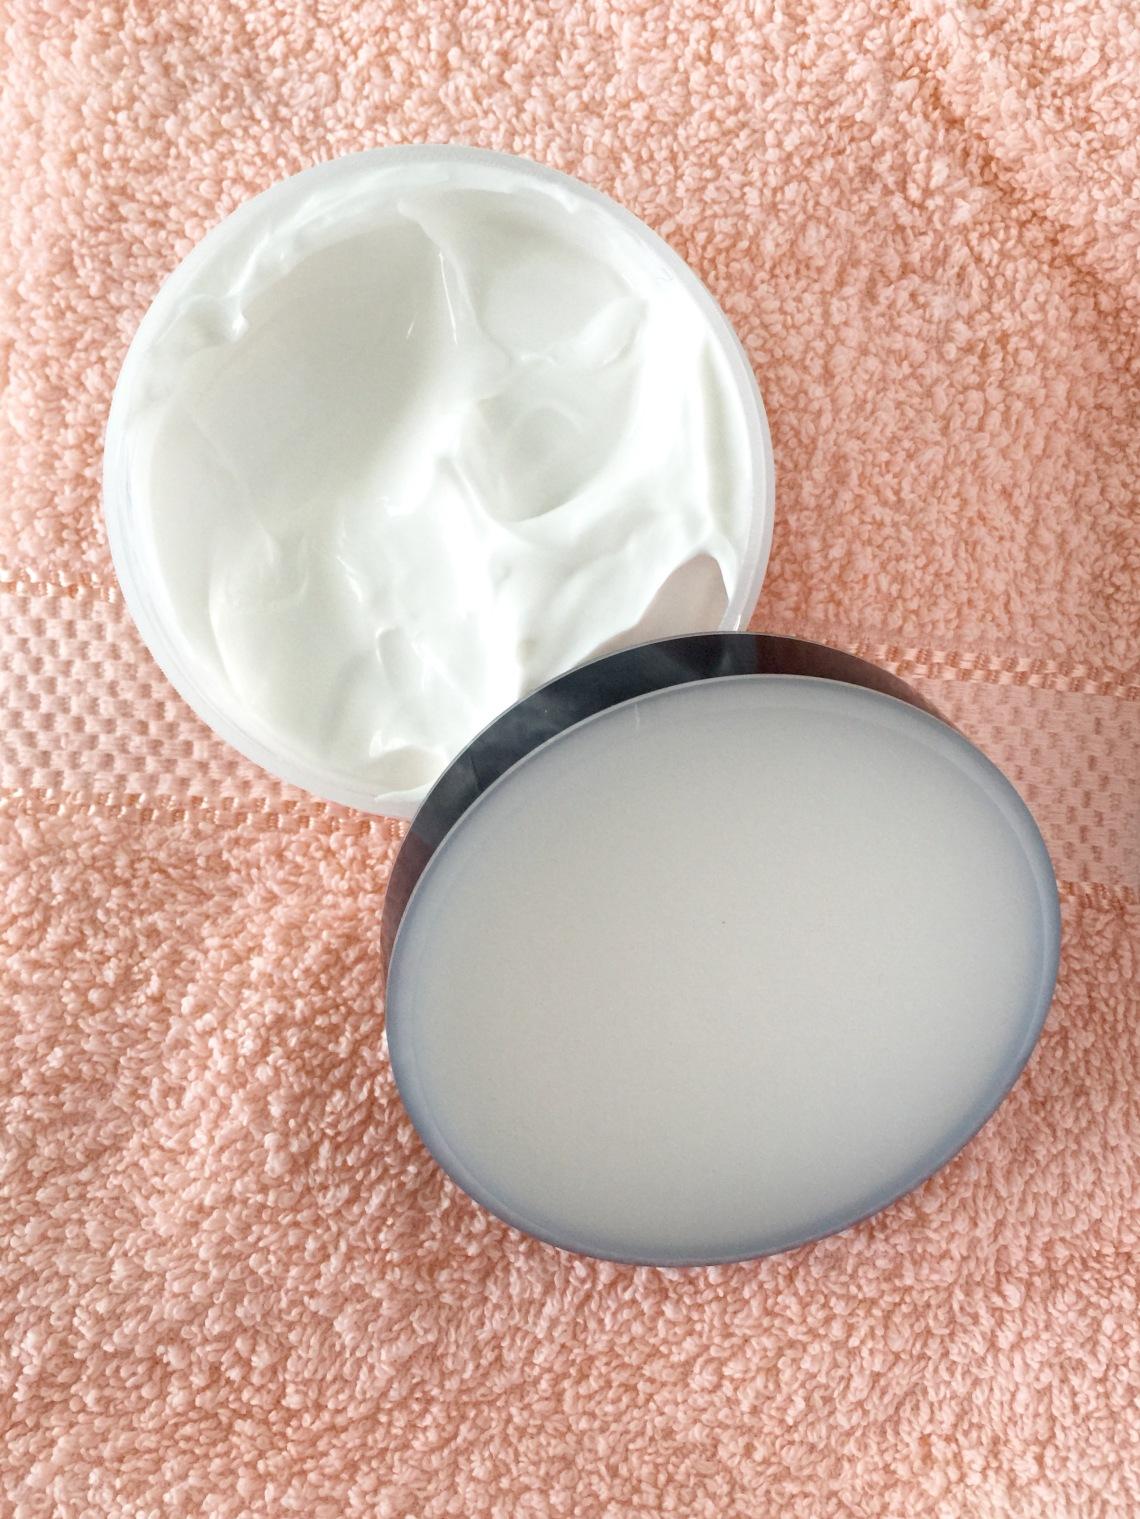 Sephora Coconut Body Butter